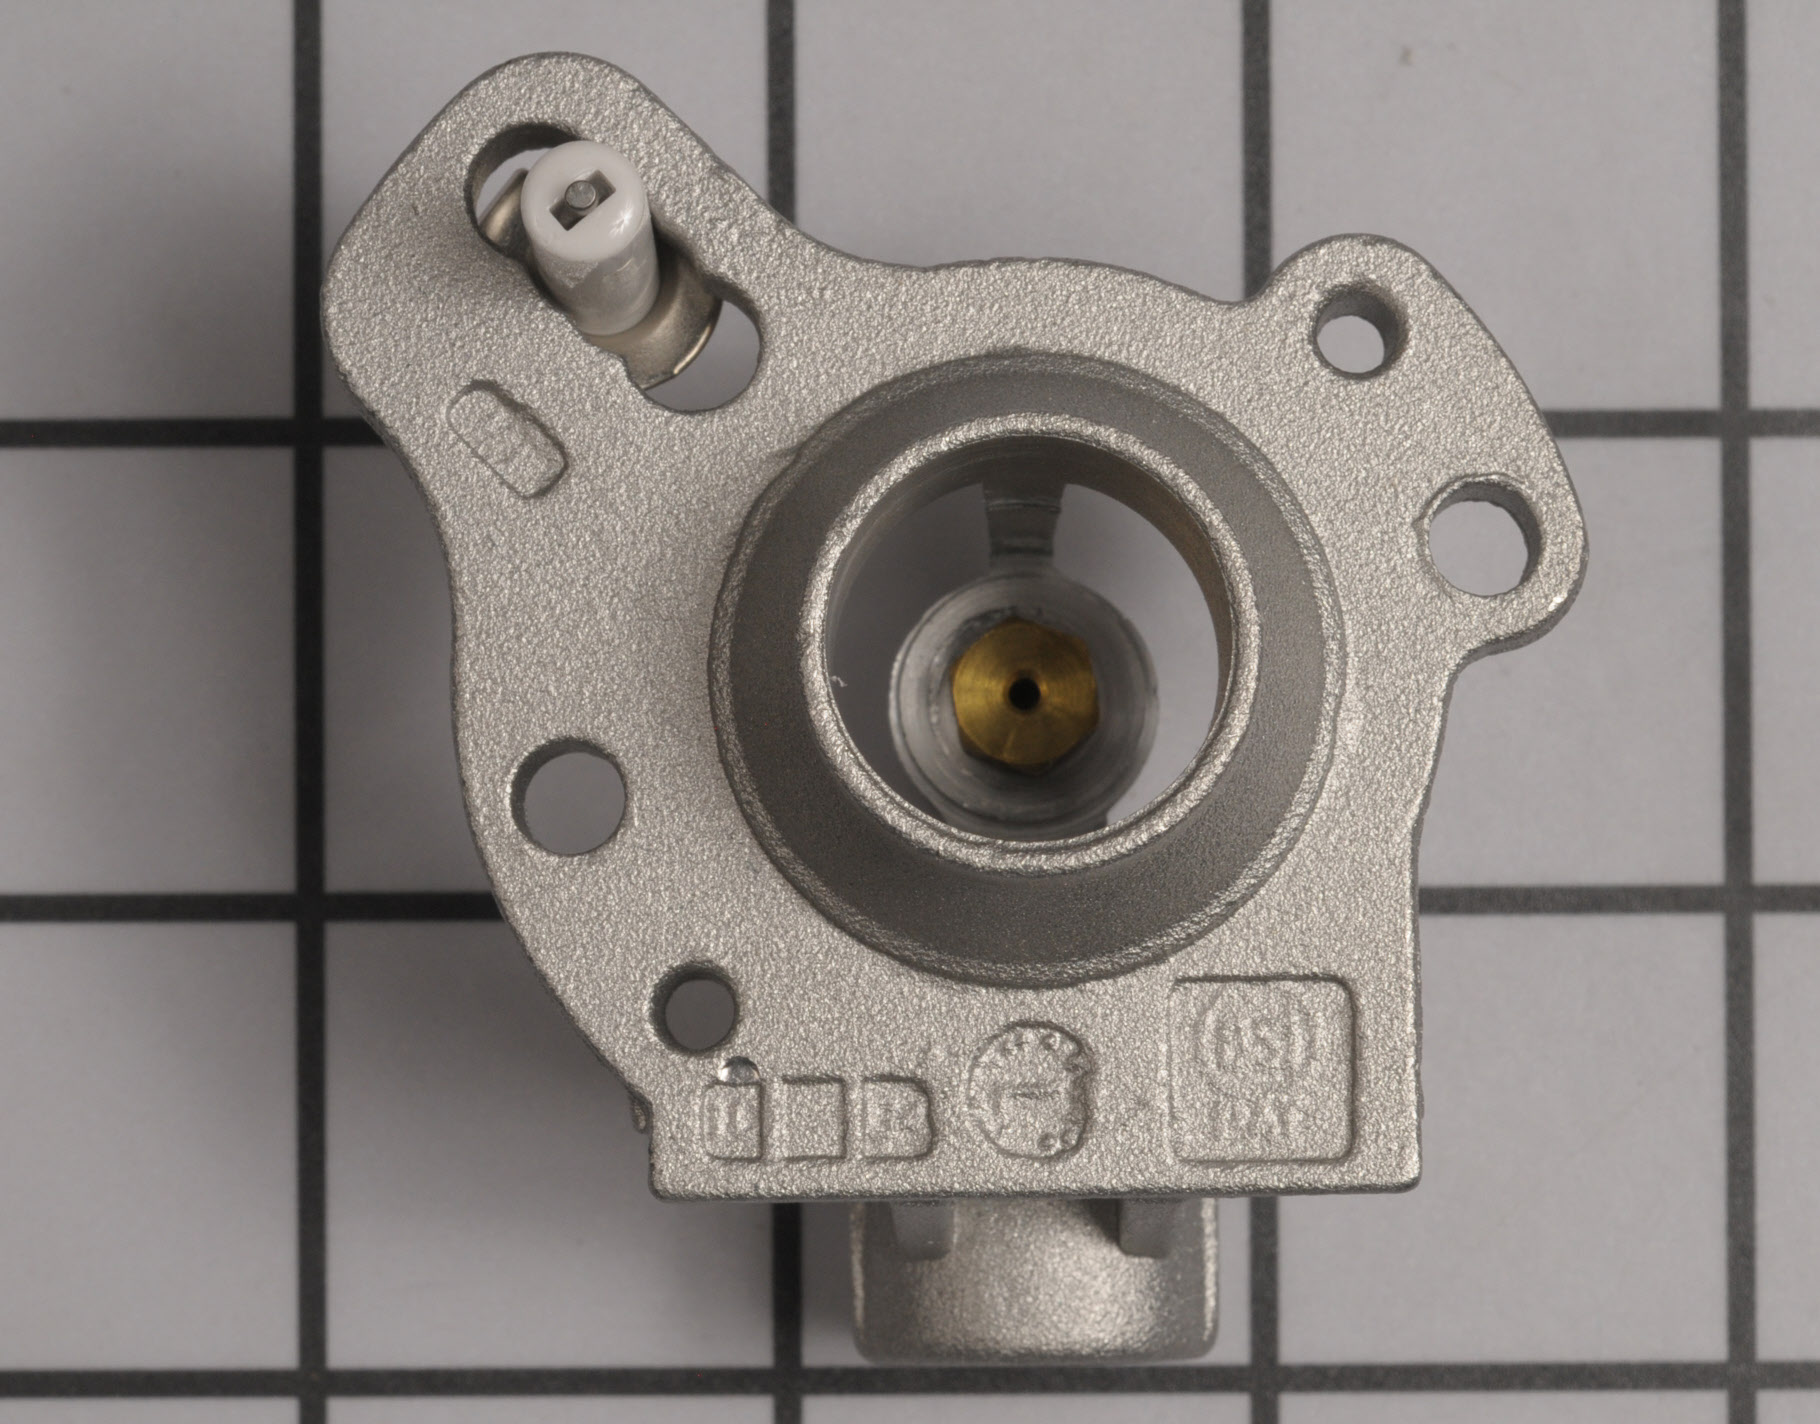 Whirlpool Range/Stove/Oven Part # WPW10128455 - Surface Burner Orifice Holder